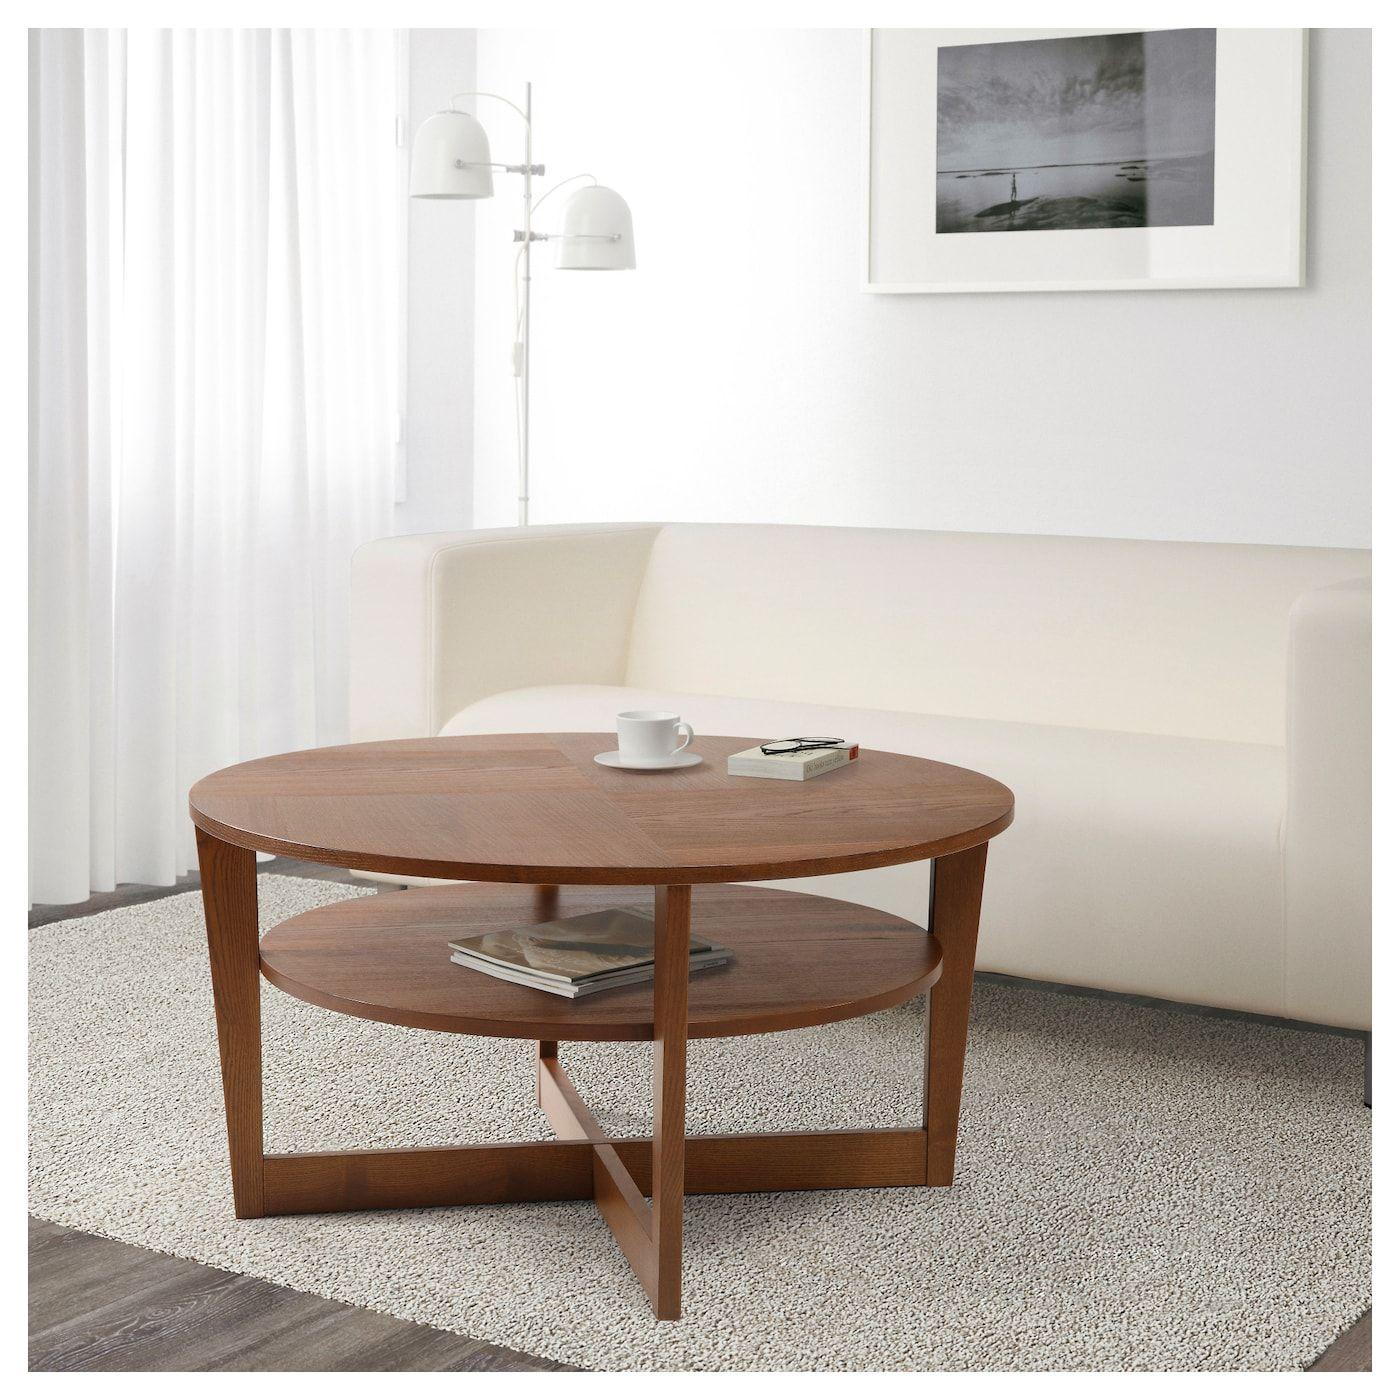 Home Furniture Store Modern Furnishings Decor Coffee Table At Home Furniture Store Furniture [ 1400 x 1400 Pixel ]